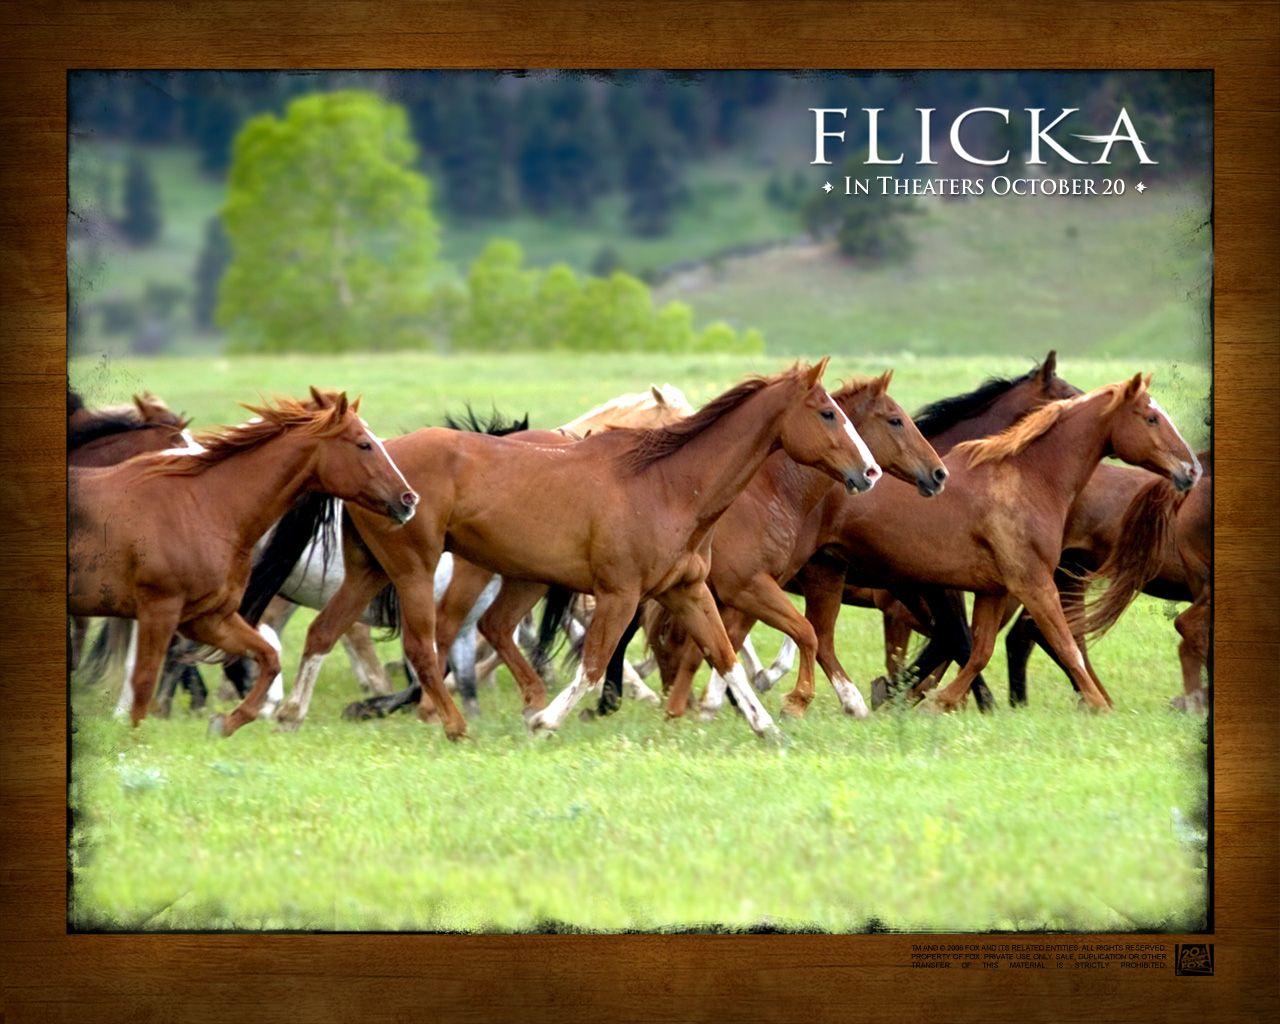 Popular Wallpaper Horse Flicka - b15b08825a7dac859c7834425e5236c6  Graphic_434617.jpg